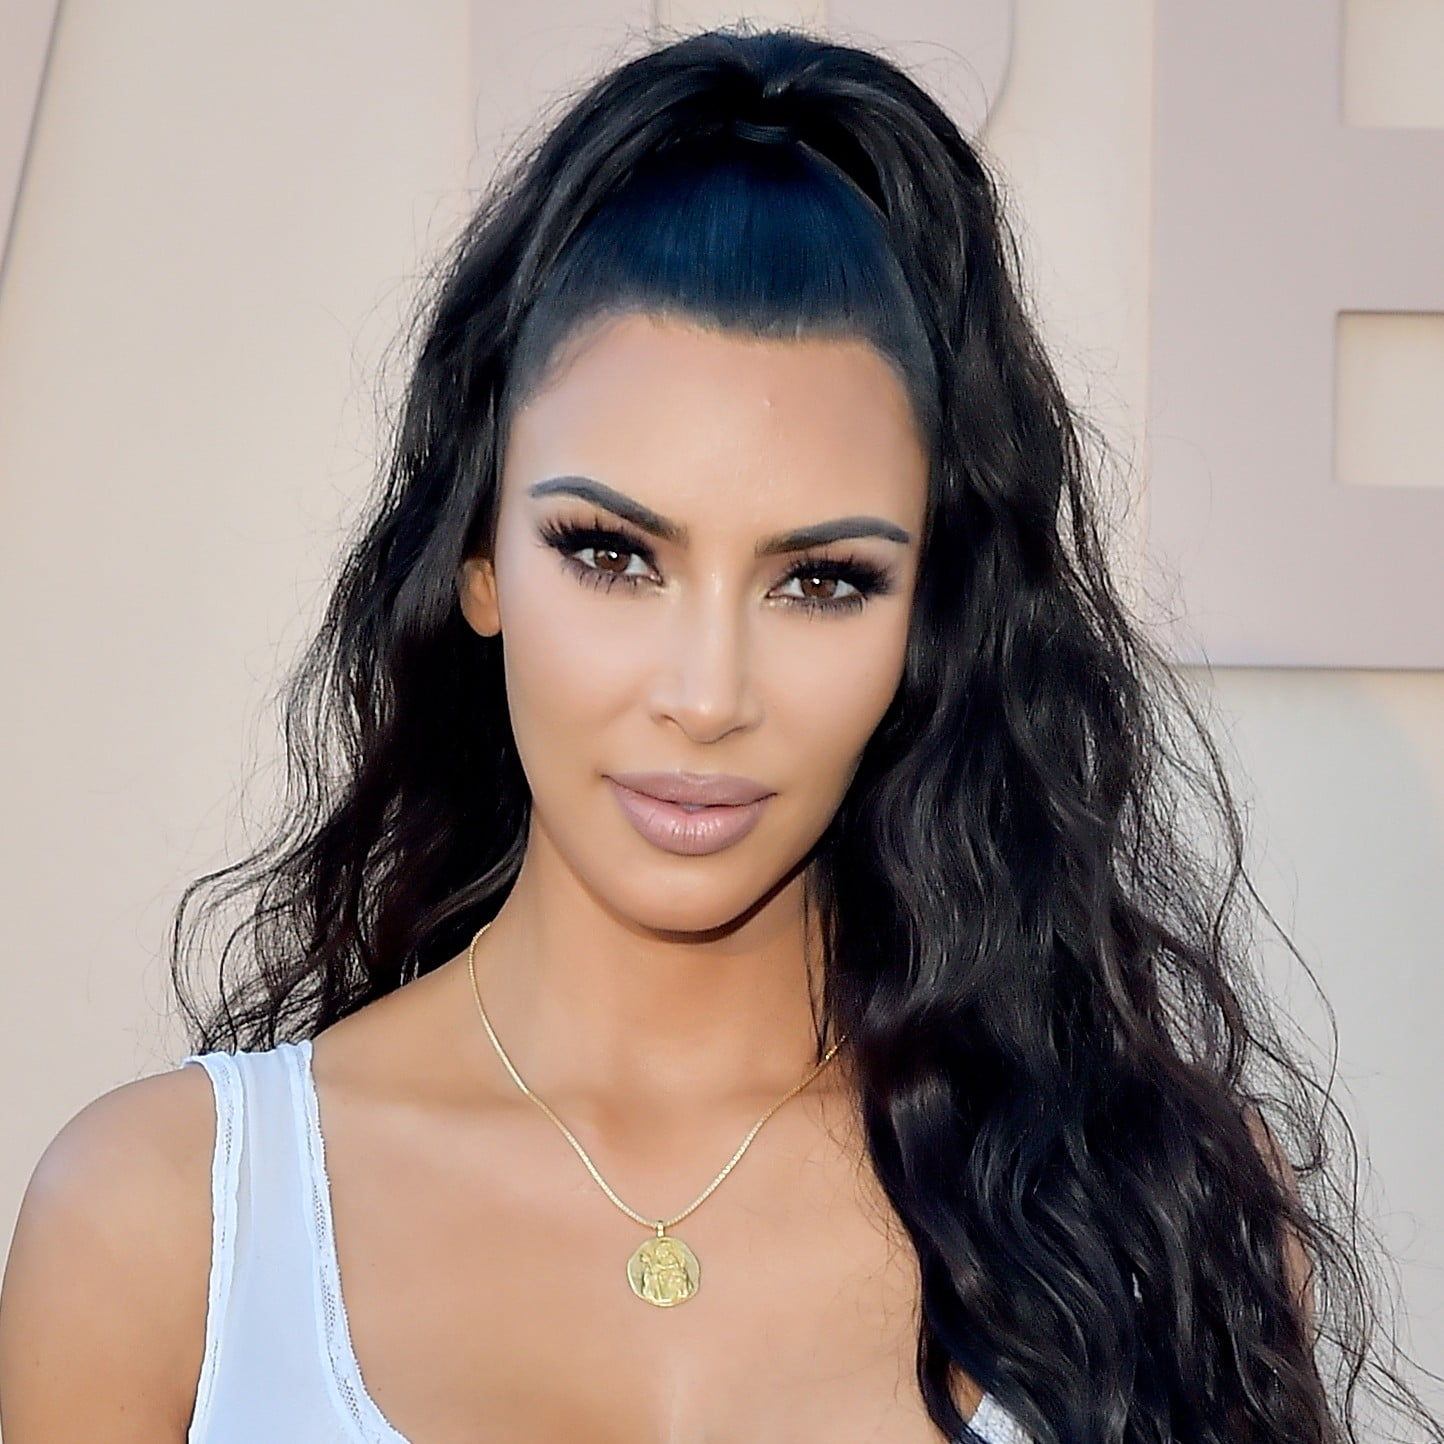 Pics Kim Kardashian nudes (96 foto and video), Topless, Bikini, Instagram, cameltoe 2020